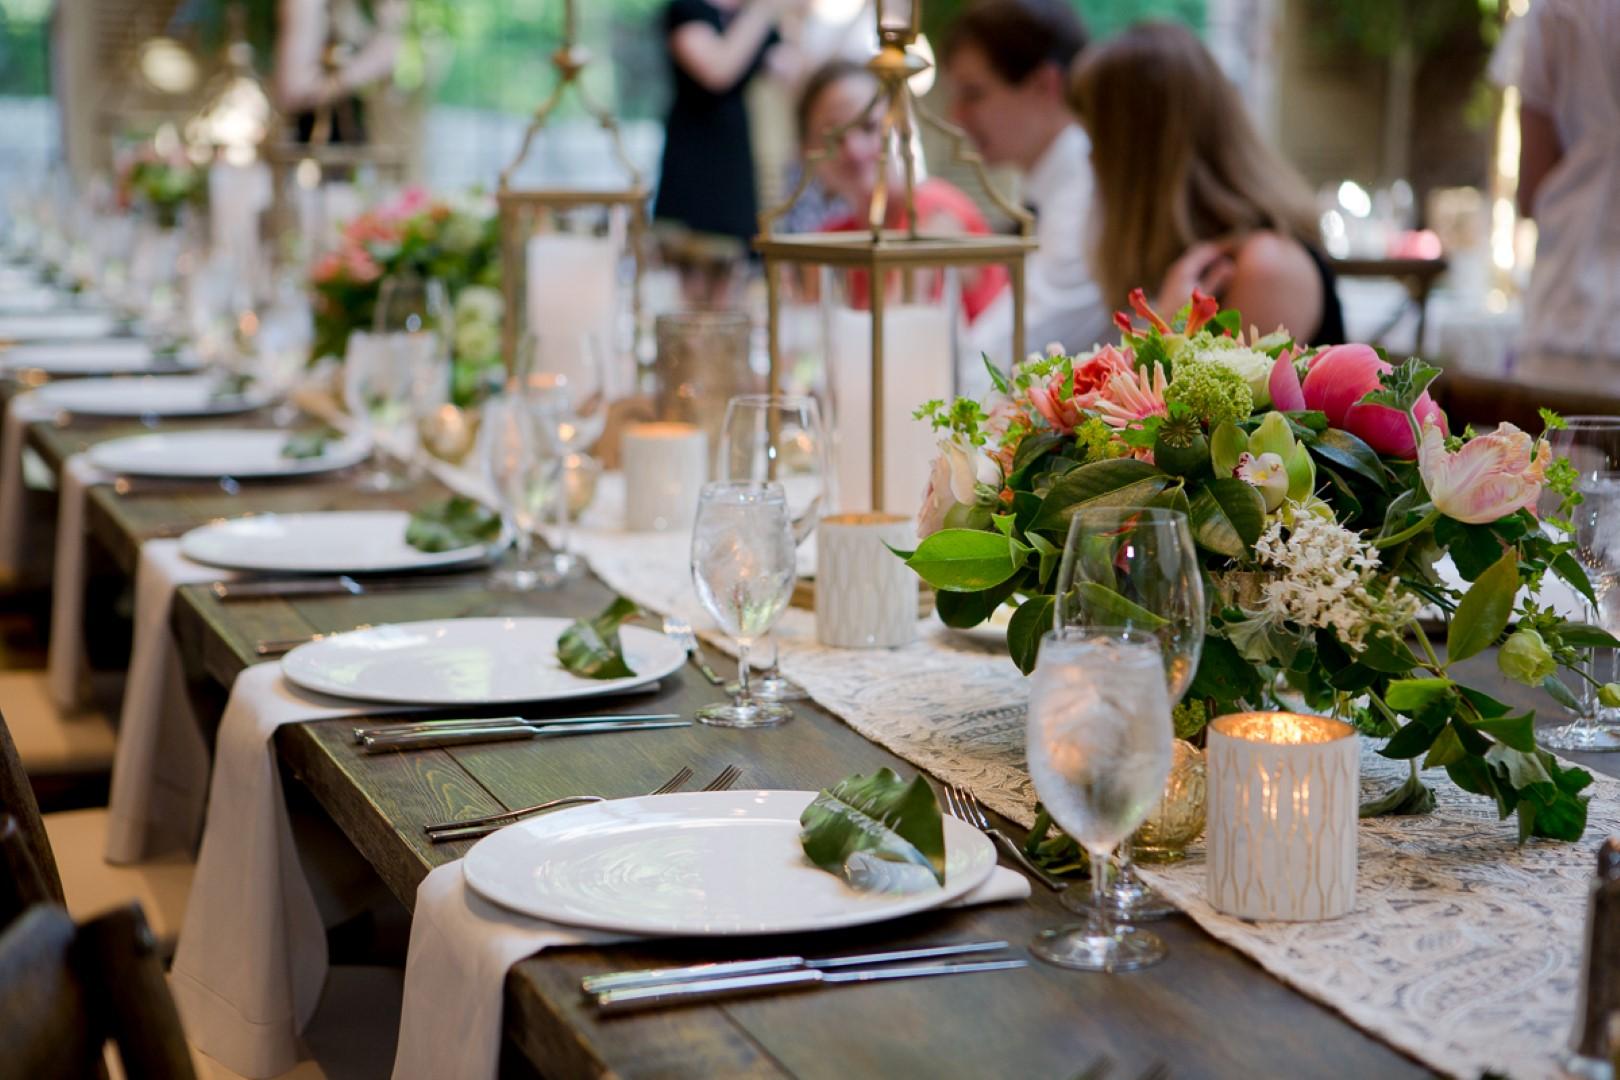 ANN & MORGAN_Rehersal Dinner-Sarah Jane Sanders-WEBB c2017-62 (Large).jpg